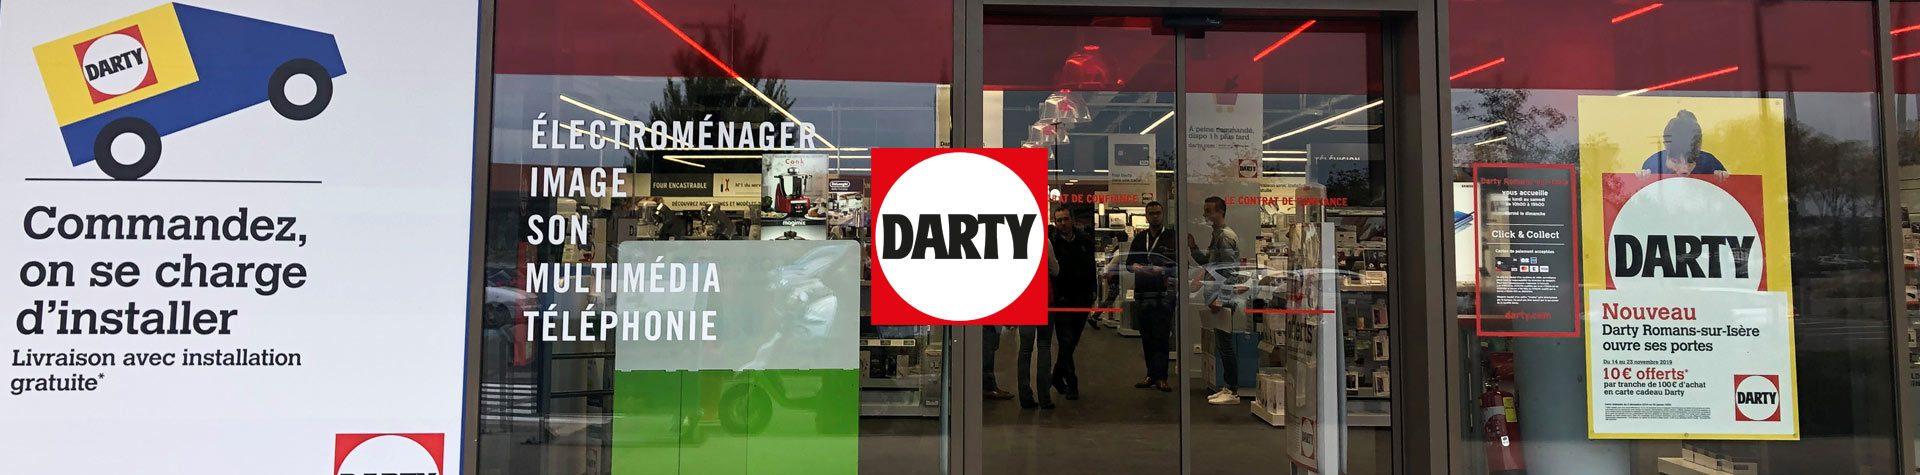 Photo bannière avec logo Darty